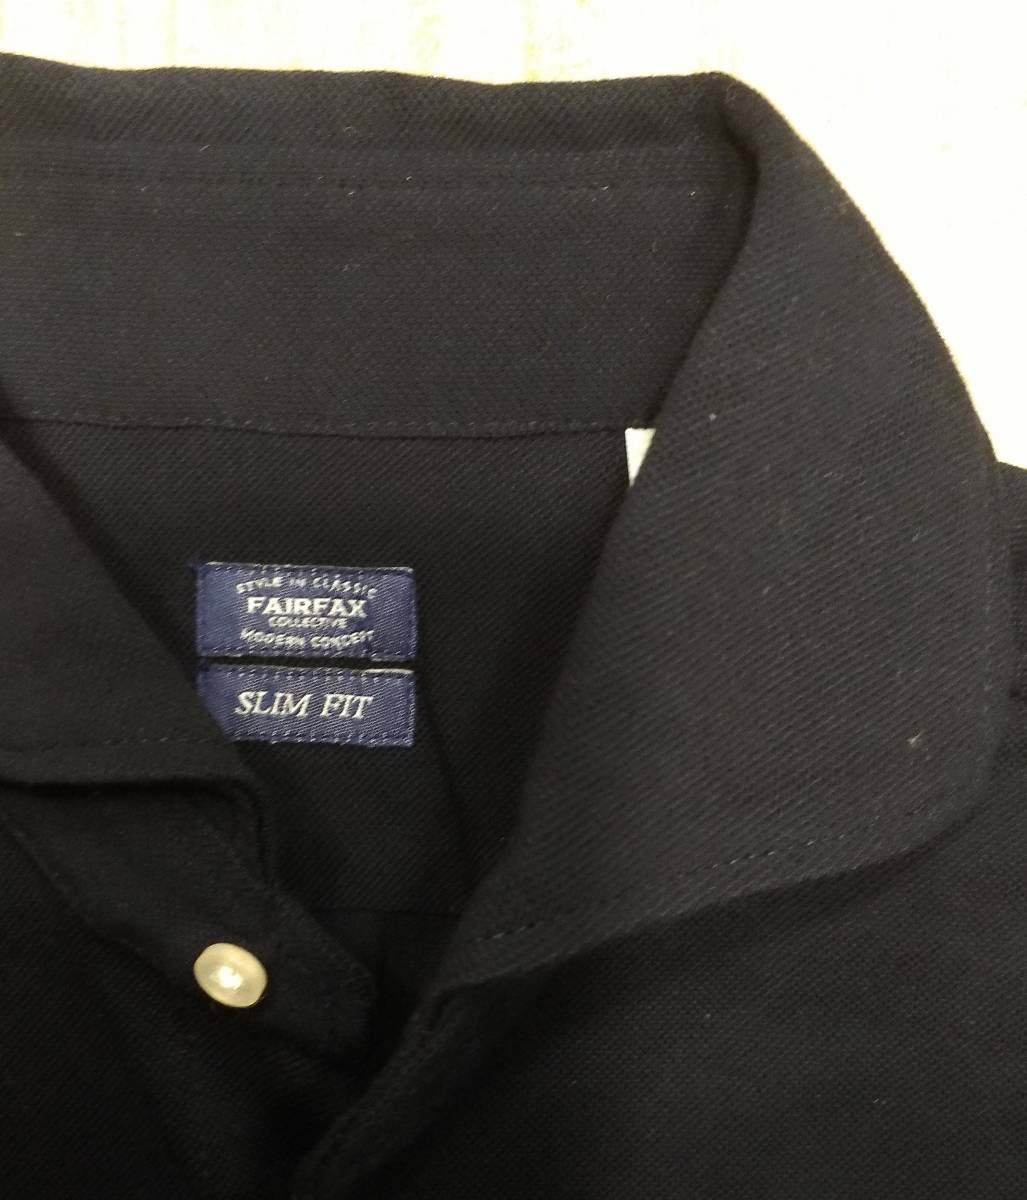 6aae58497033d0 代購代標第一品牌- 樂淘letao - Fairfax フェアファックスシャツ紺